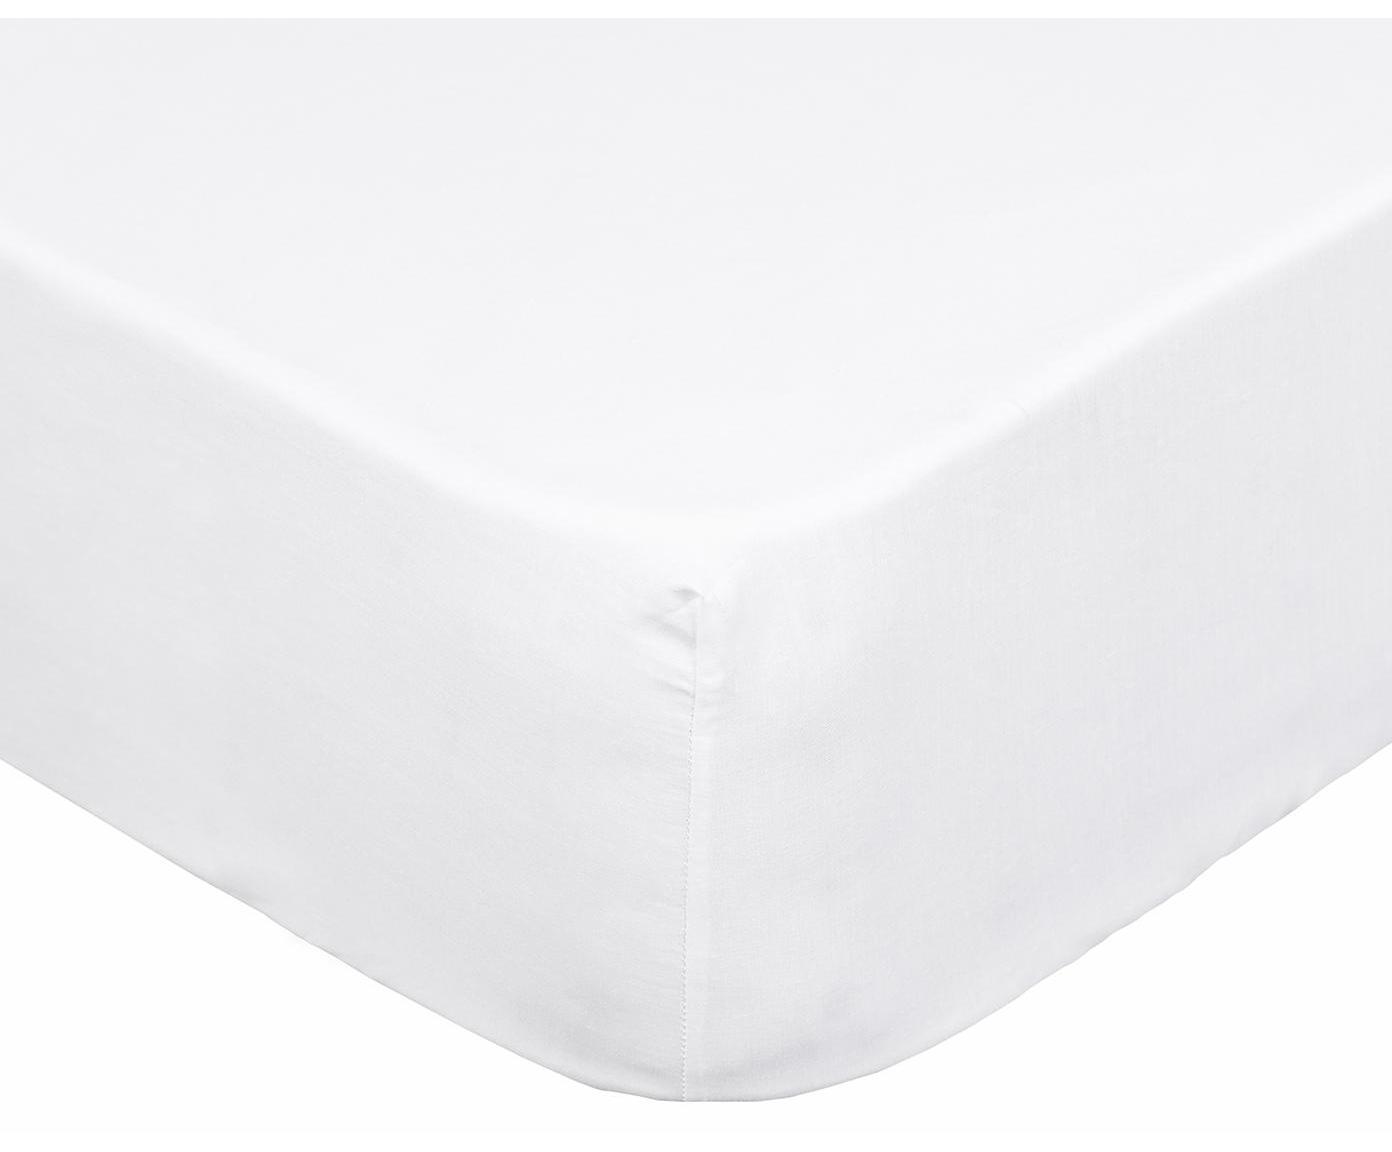 Sábana bajera Brunoba, 50%algodón, 50%poliéster, Blanco, Cama 135/140 cm (135 x 200 cm)